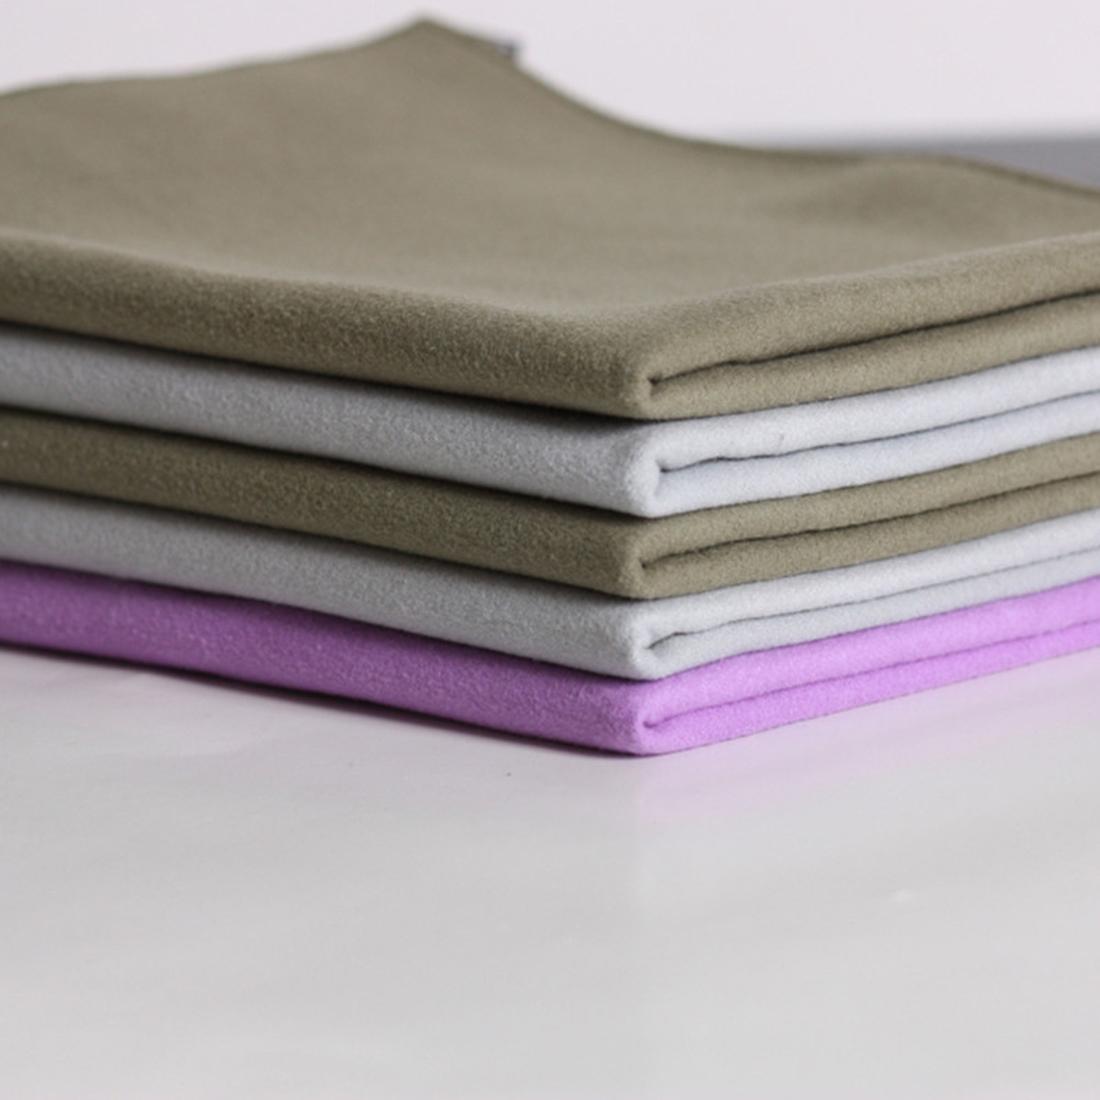 Best Mens Gym Towel: Gym Sweat Towels Promotion-Shop For Promotional Gym Sweat